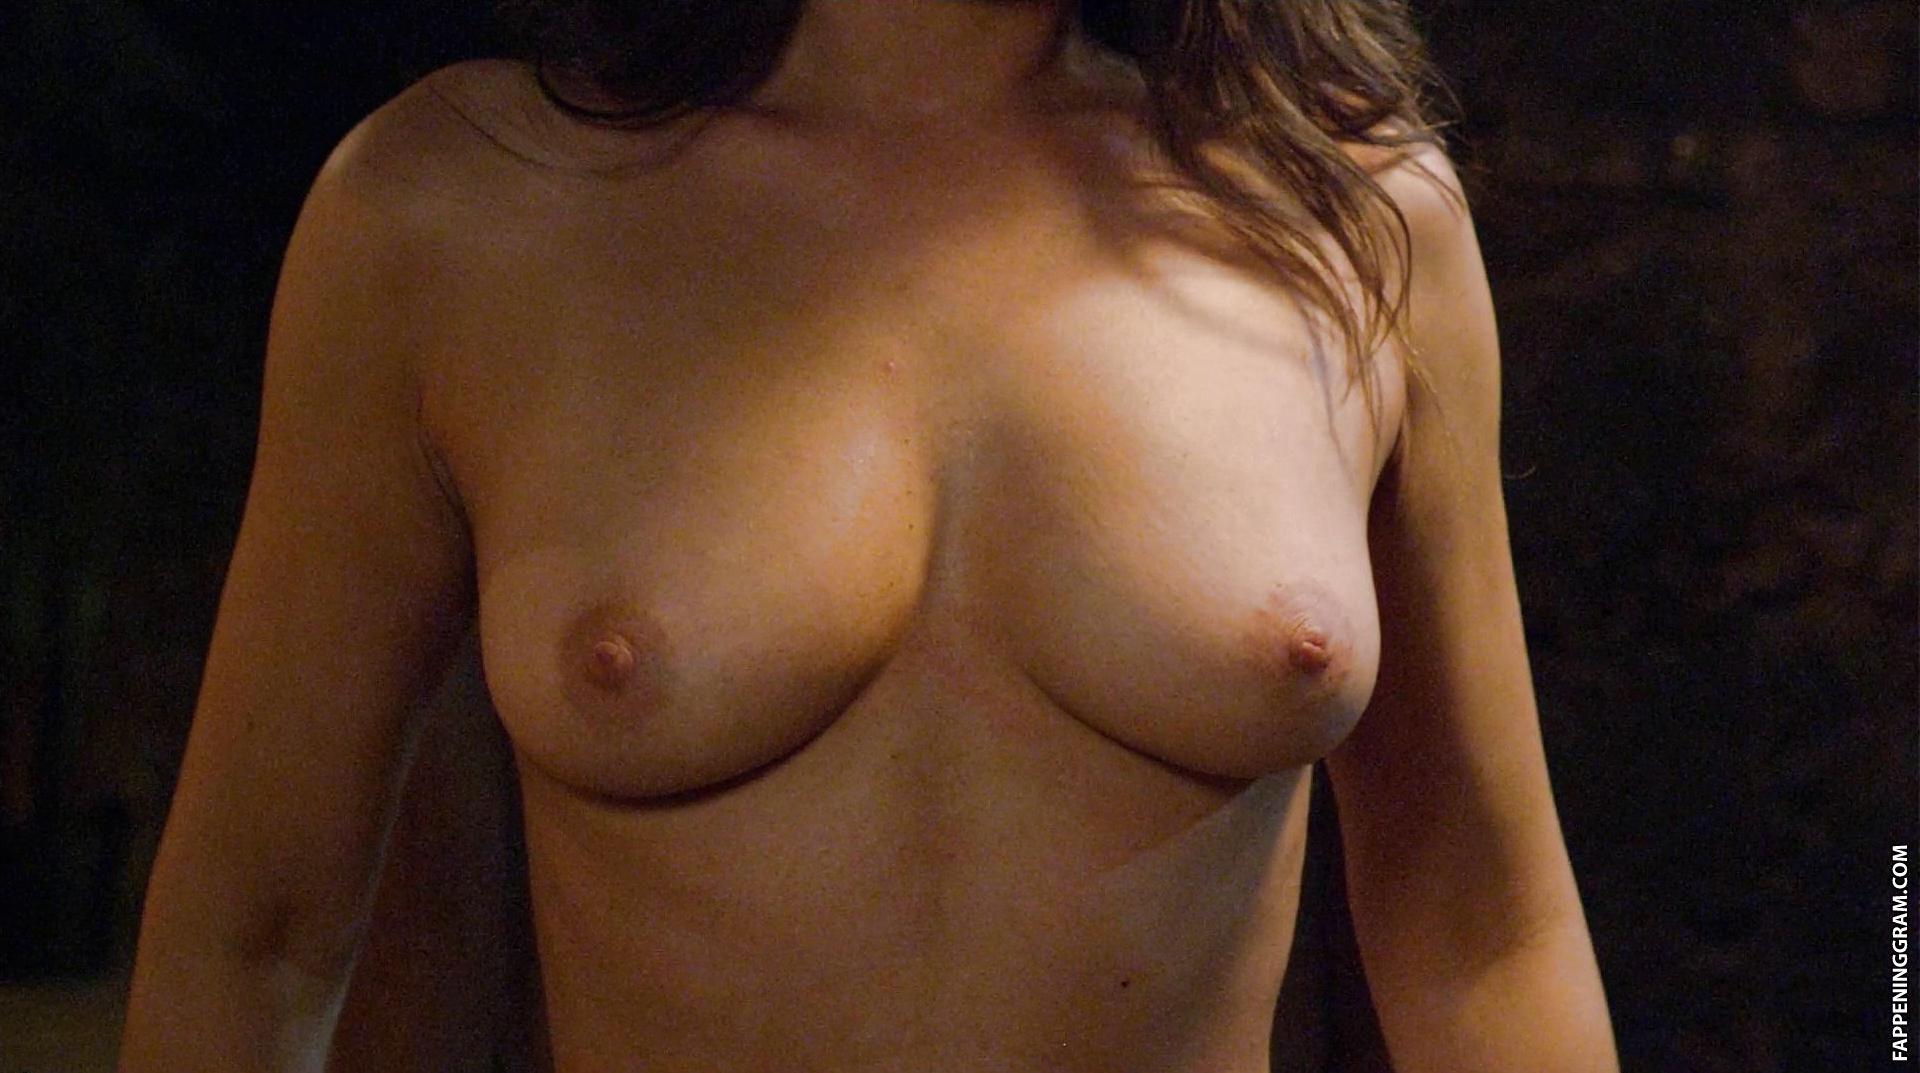 Jessica brytn flannery nude aznude